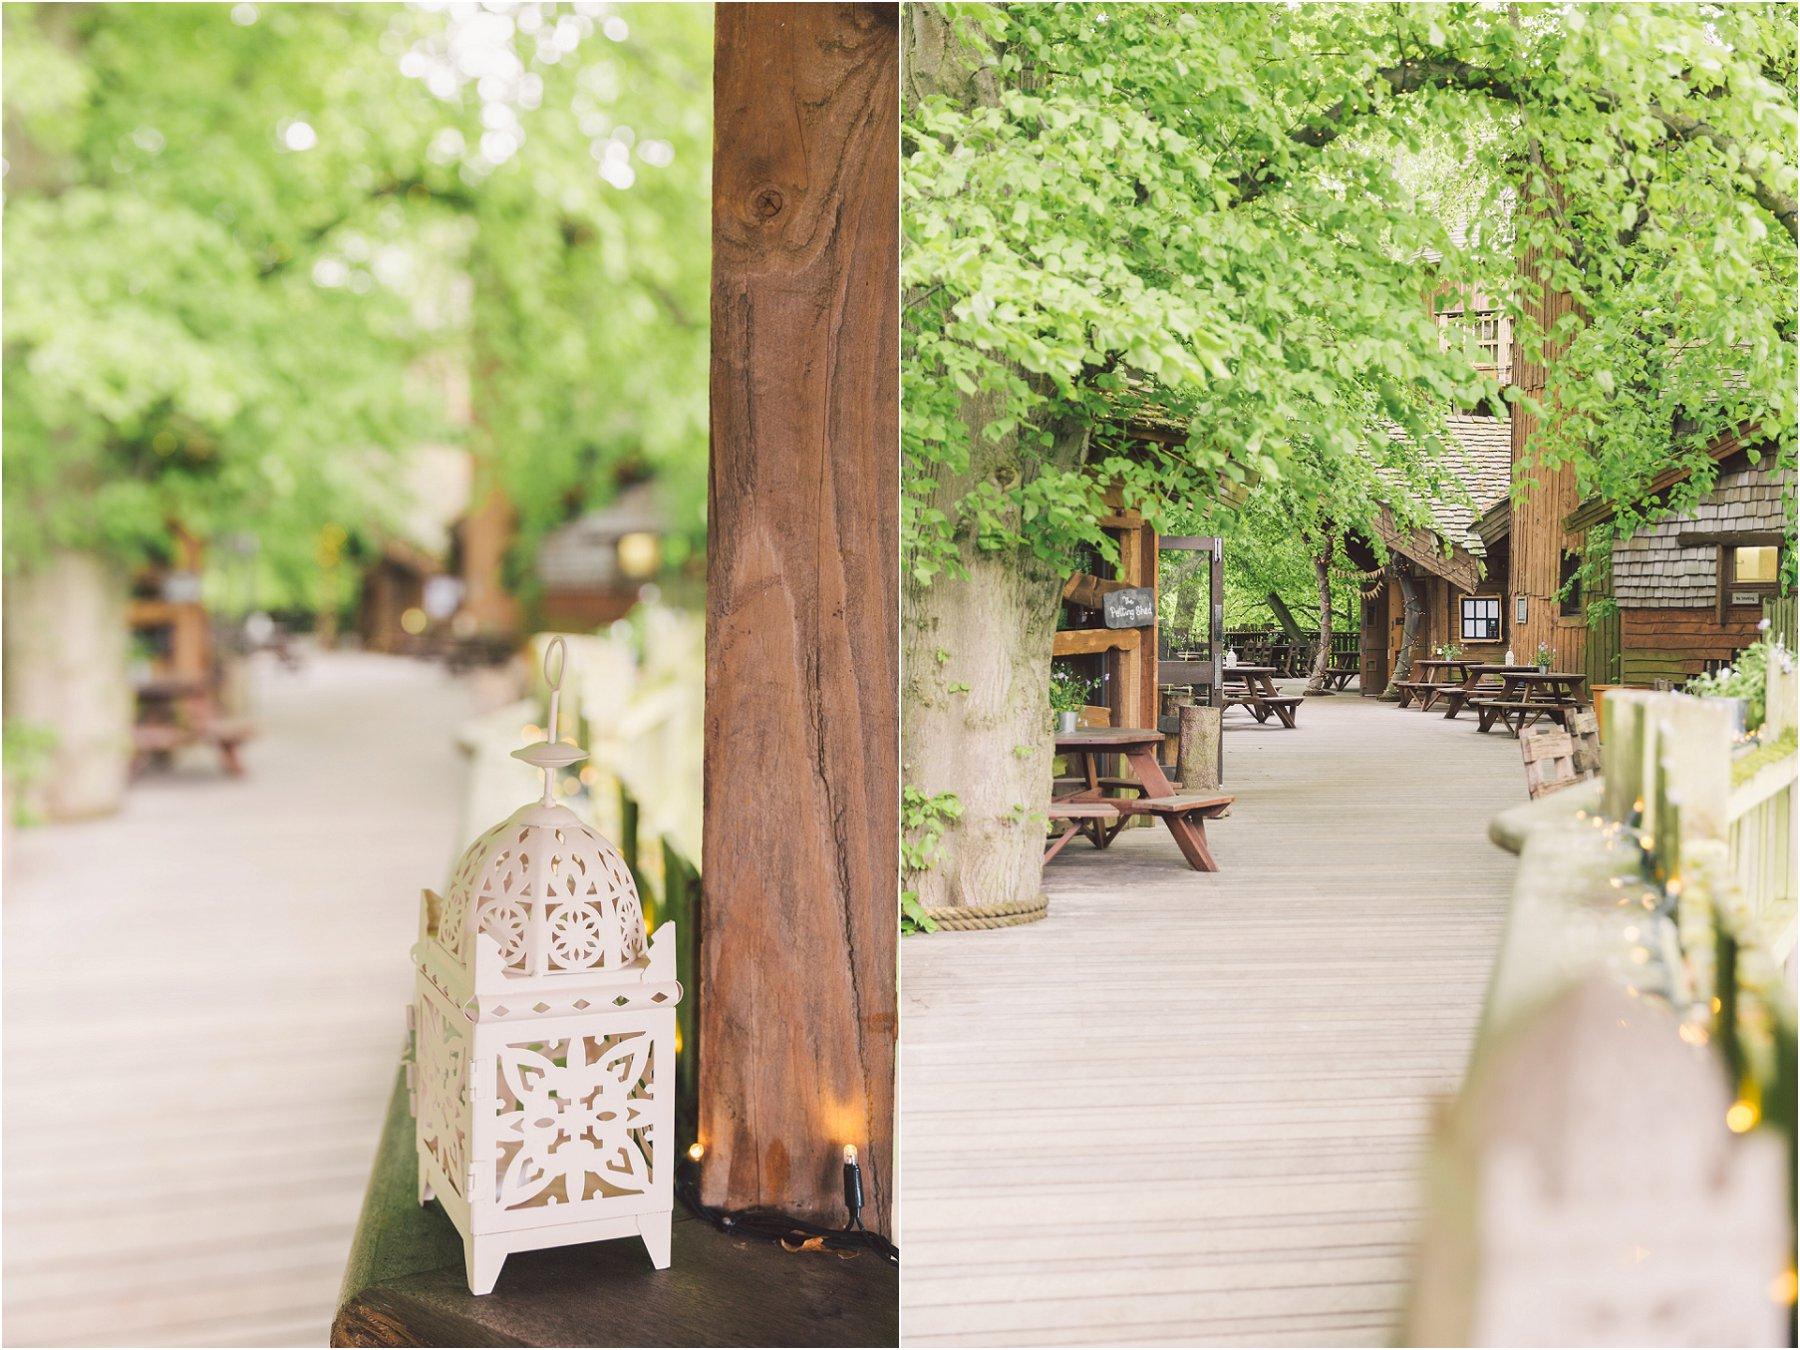 eve.photography.relaxed.creative.wedding.destination._0279.jpg